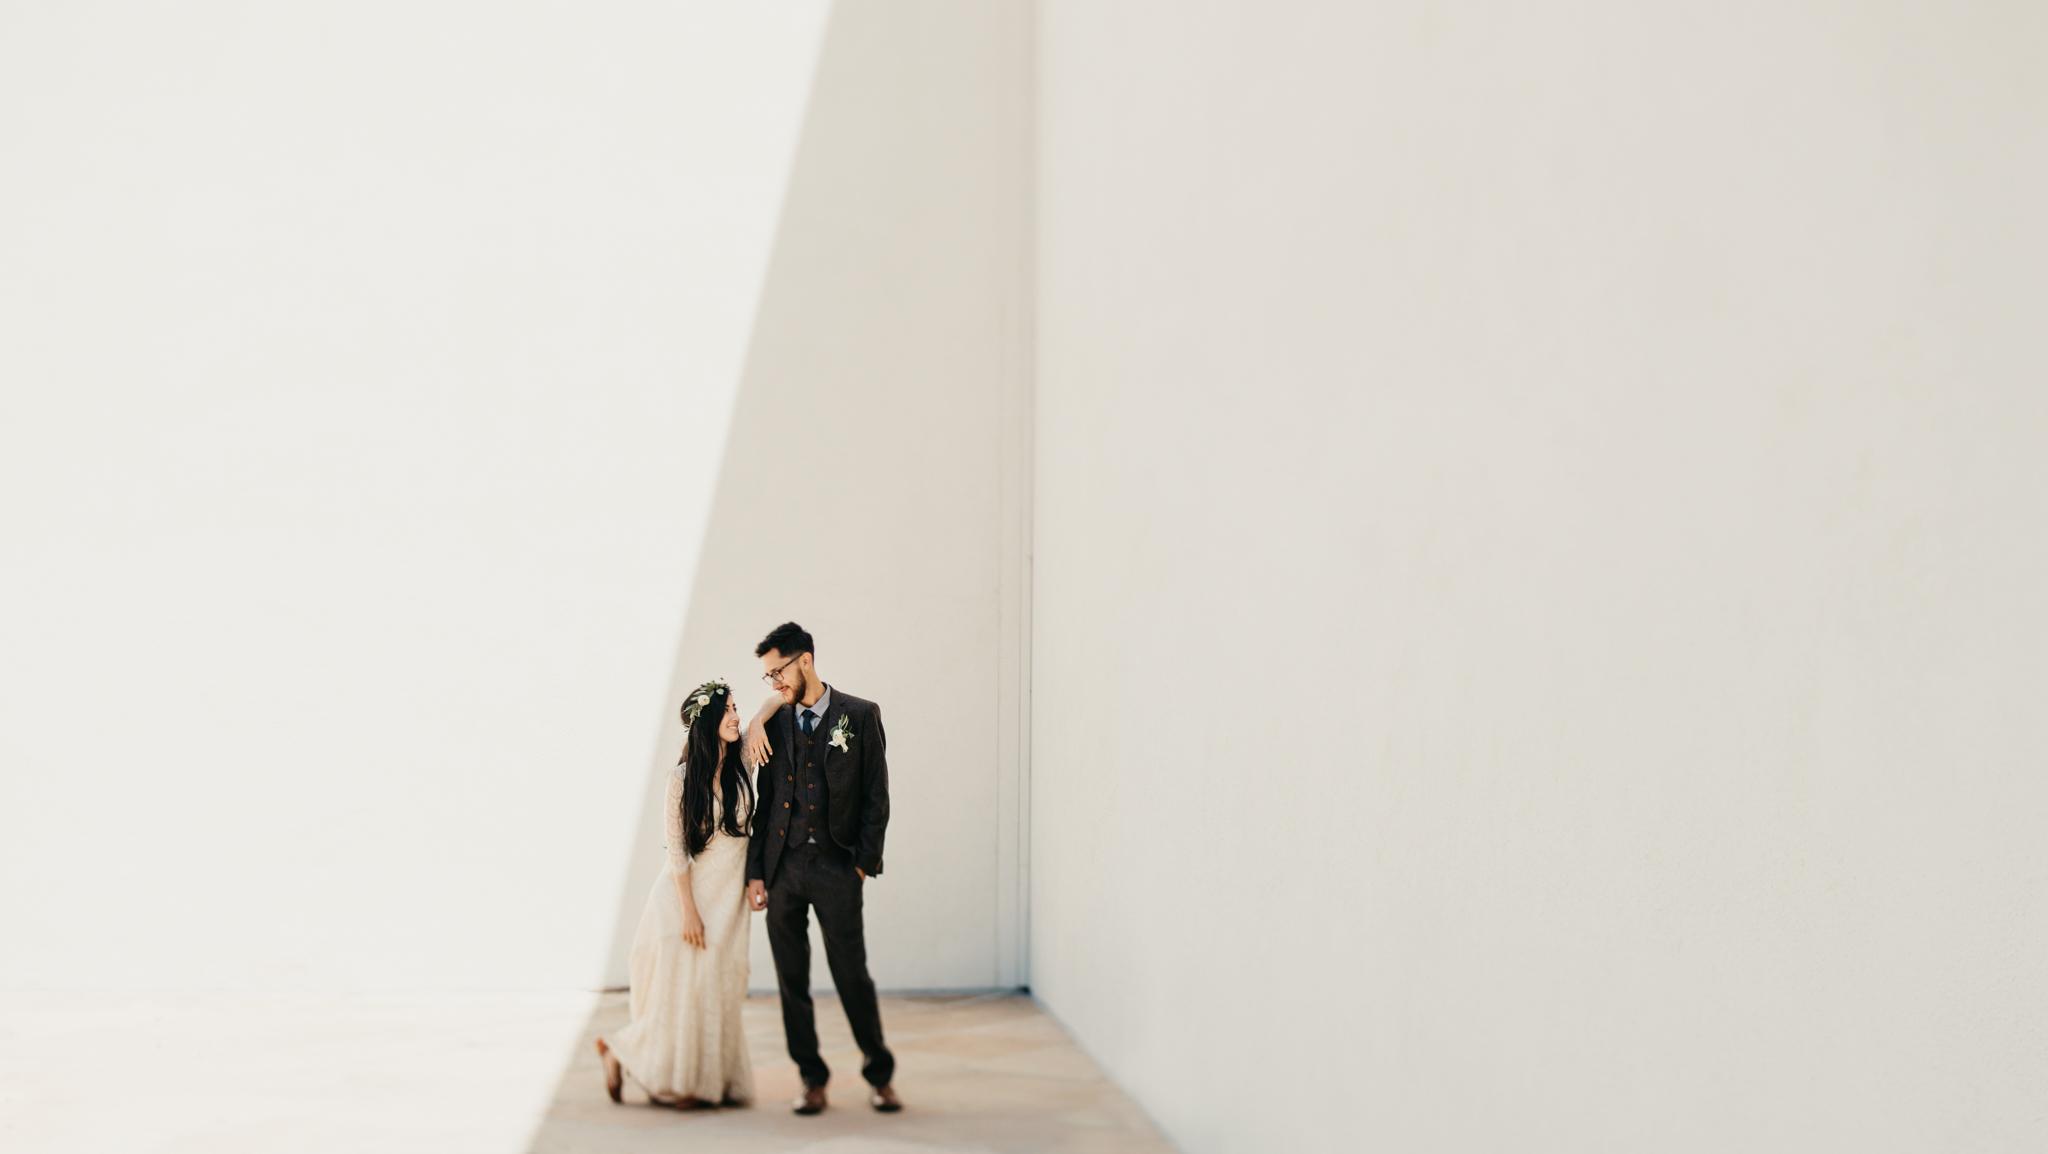 ©Isaiah-&-Taylor-Photography---Oak-Canyon-Nature-Center-Wedding,-Anaheim-Hills-078.jpg